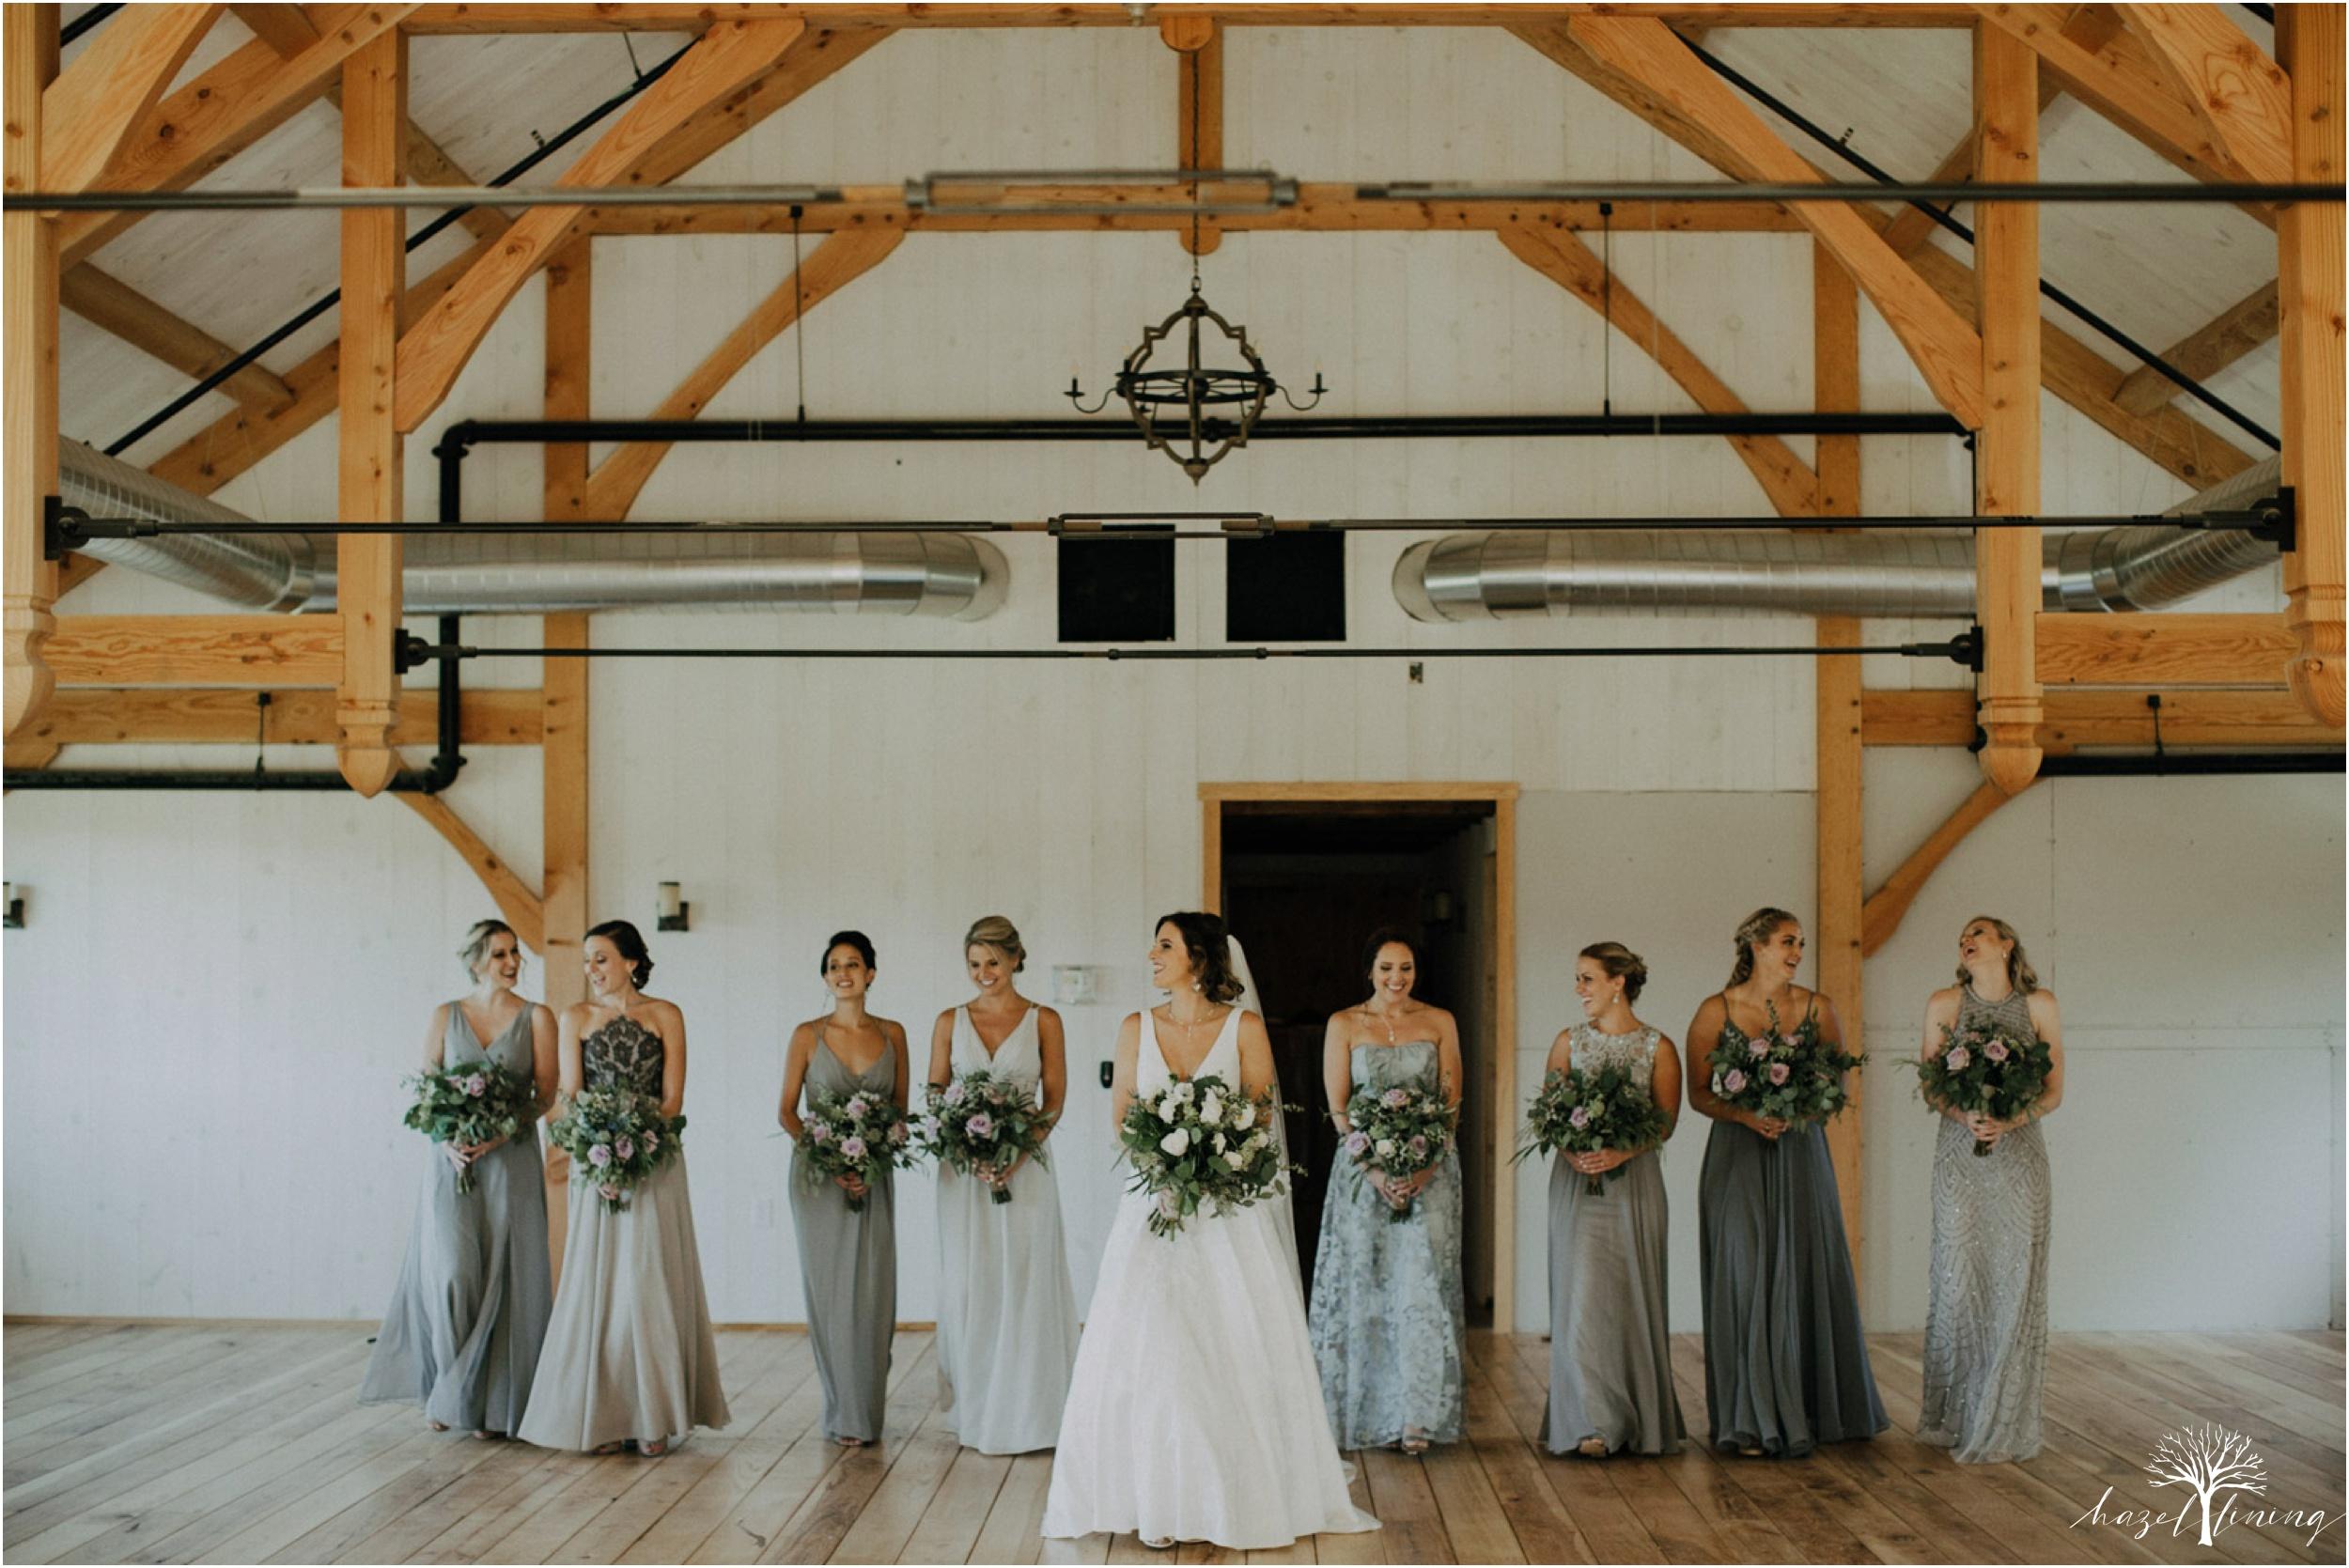 maureen-hepner-anthony-giordano-rose-bank-winery-newtow-pennsylvania-luxury-summer-wedding-hazel-lining-photography-destination-elopement-wedding-engagement-photography_0031.jpg